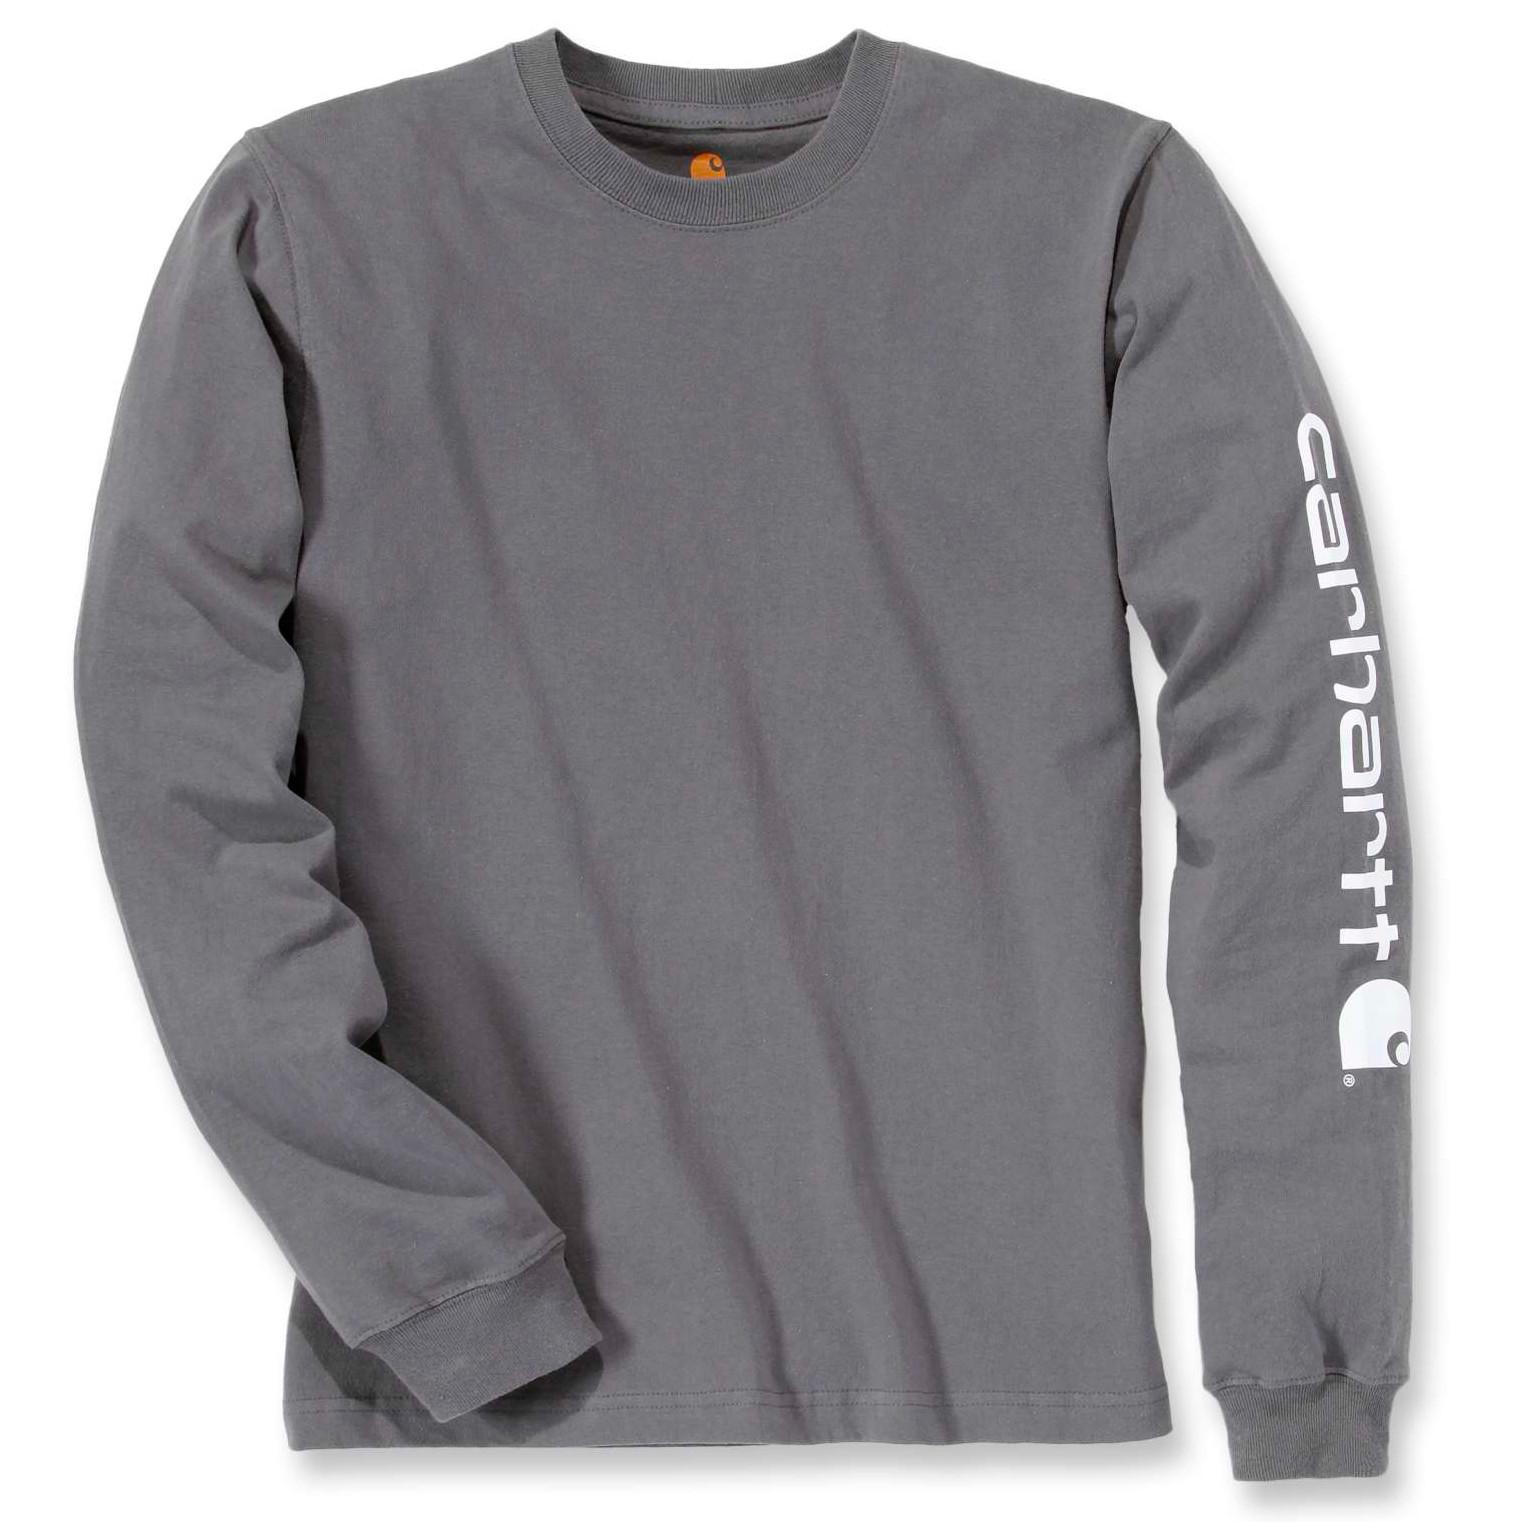 Футболка с длинным рукавом Carhartt Sleeve Logo T-Shirt L/S - EK231 (Charcoal, M)